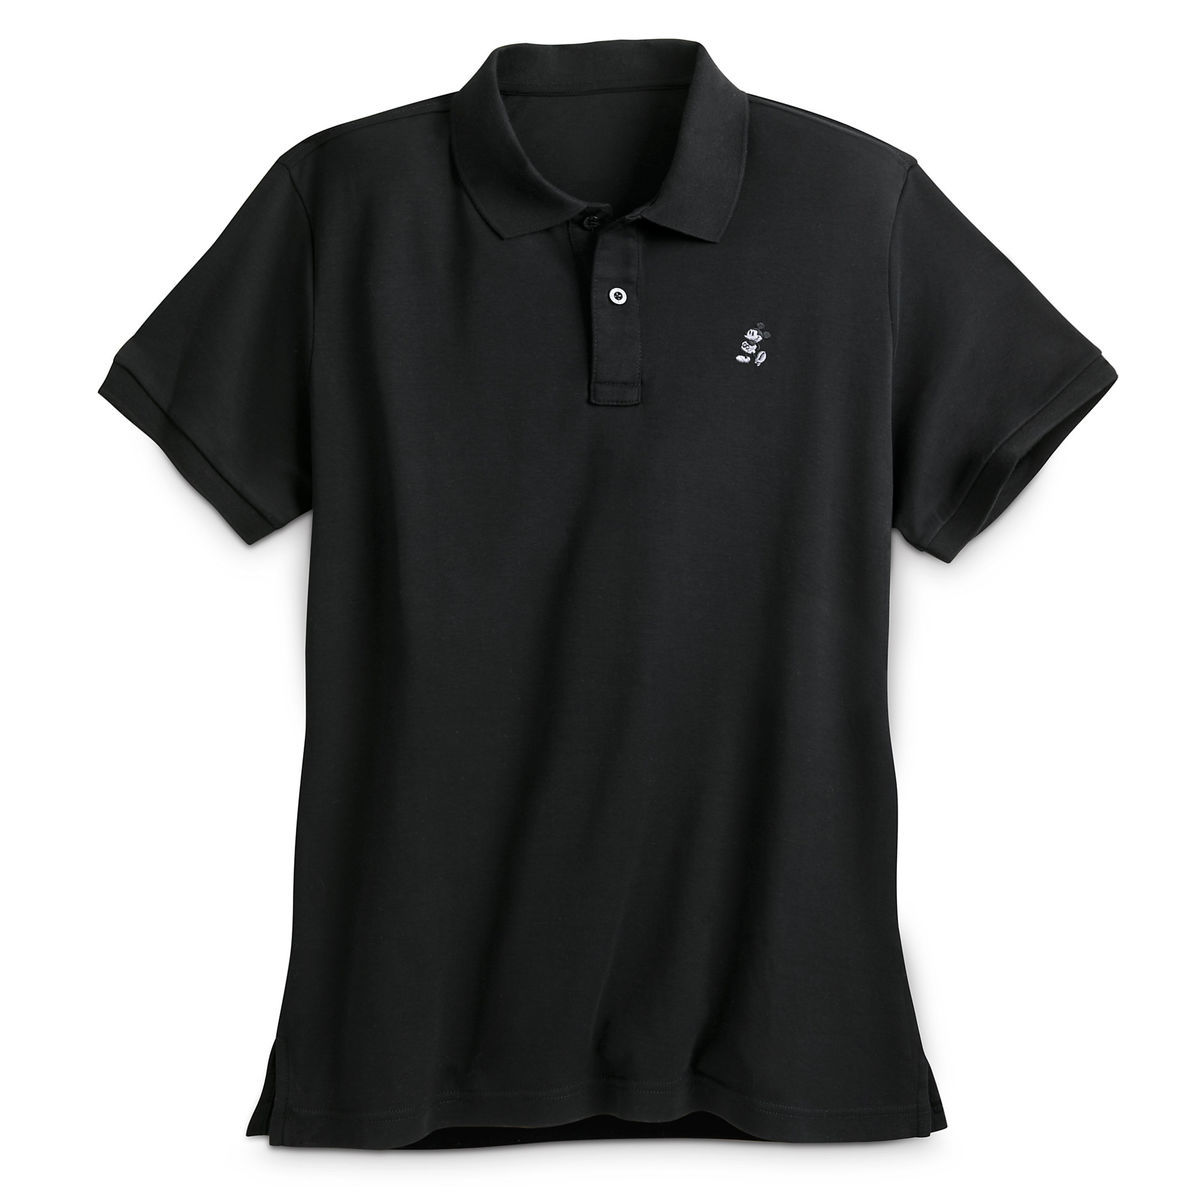 Mickey Mouse Pima Cotton Polo Shirt For Men Black Shopdisney